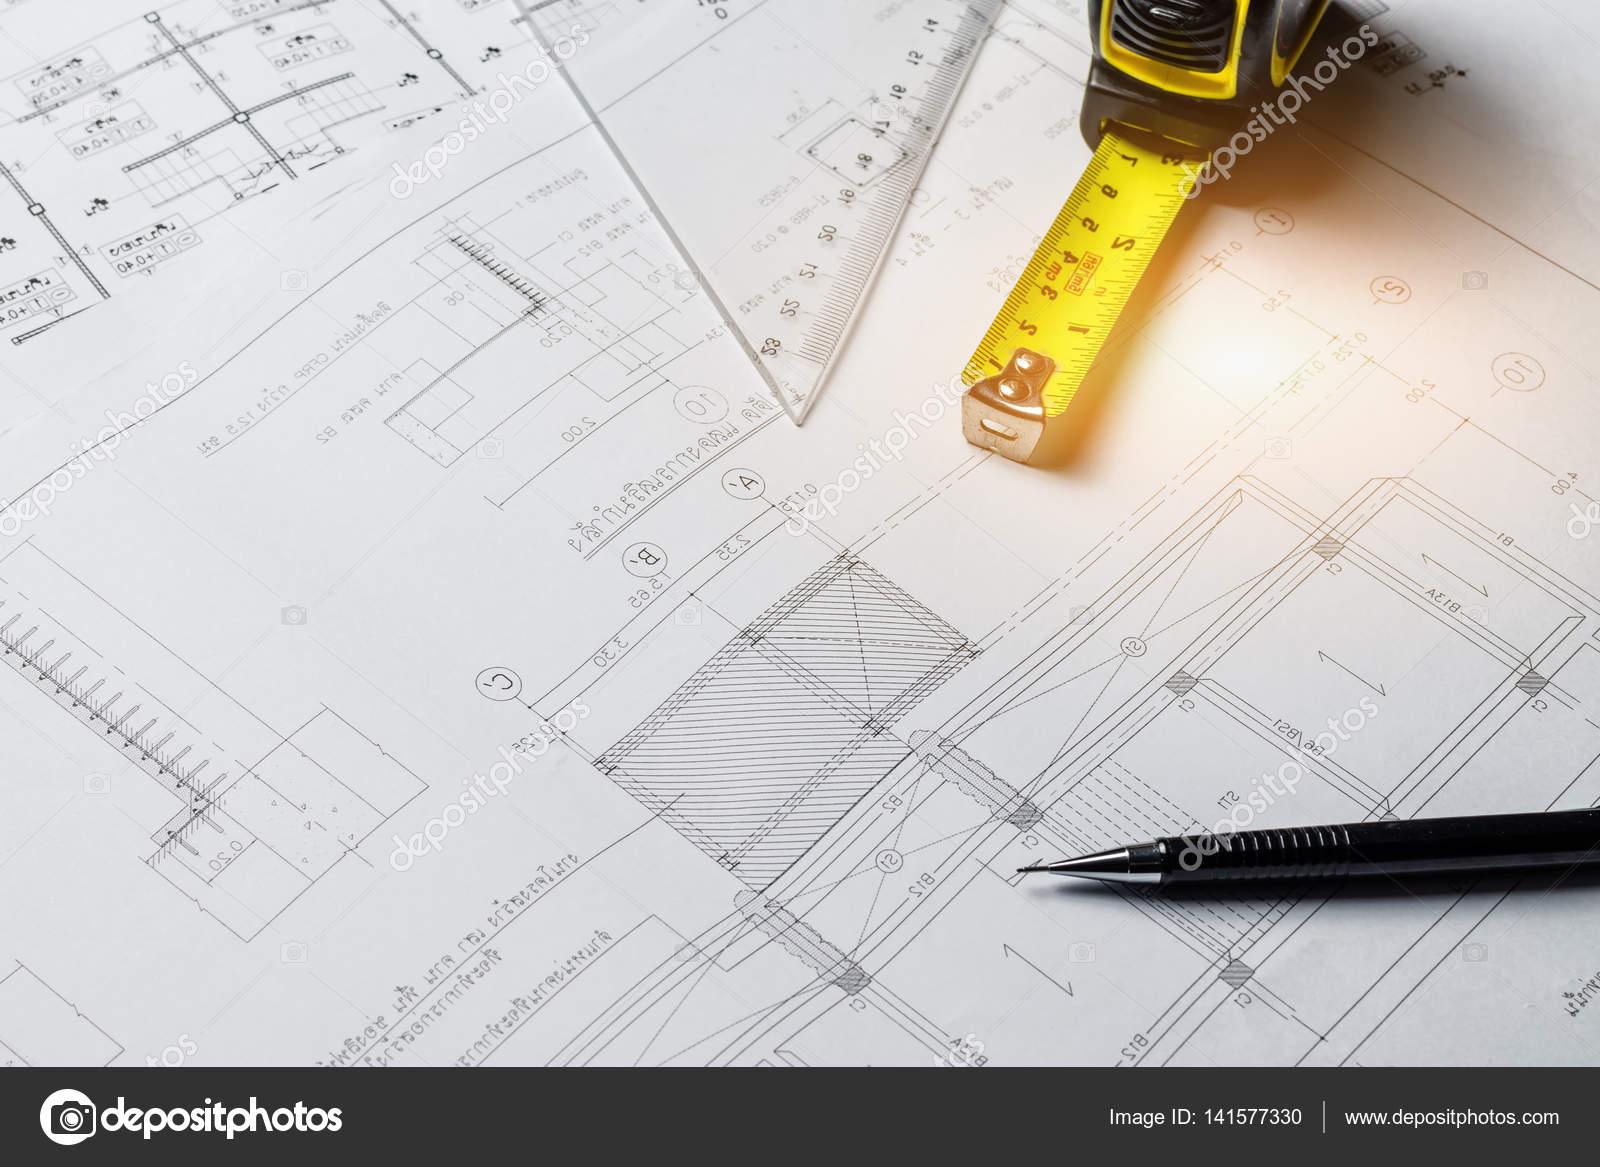 Engineering diagram blueprint paper drafting project sketch arch engineering diagram blueprint paper drafting project sketch arch stock photo malvernweather Choice Image